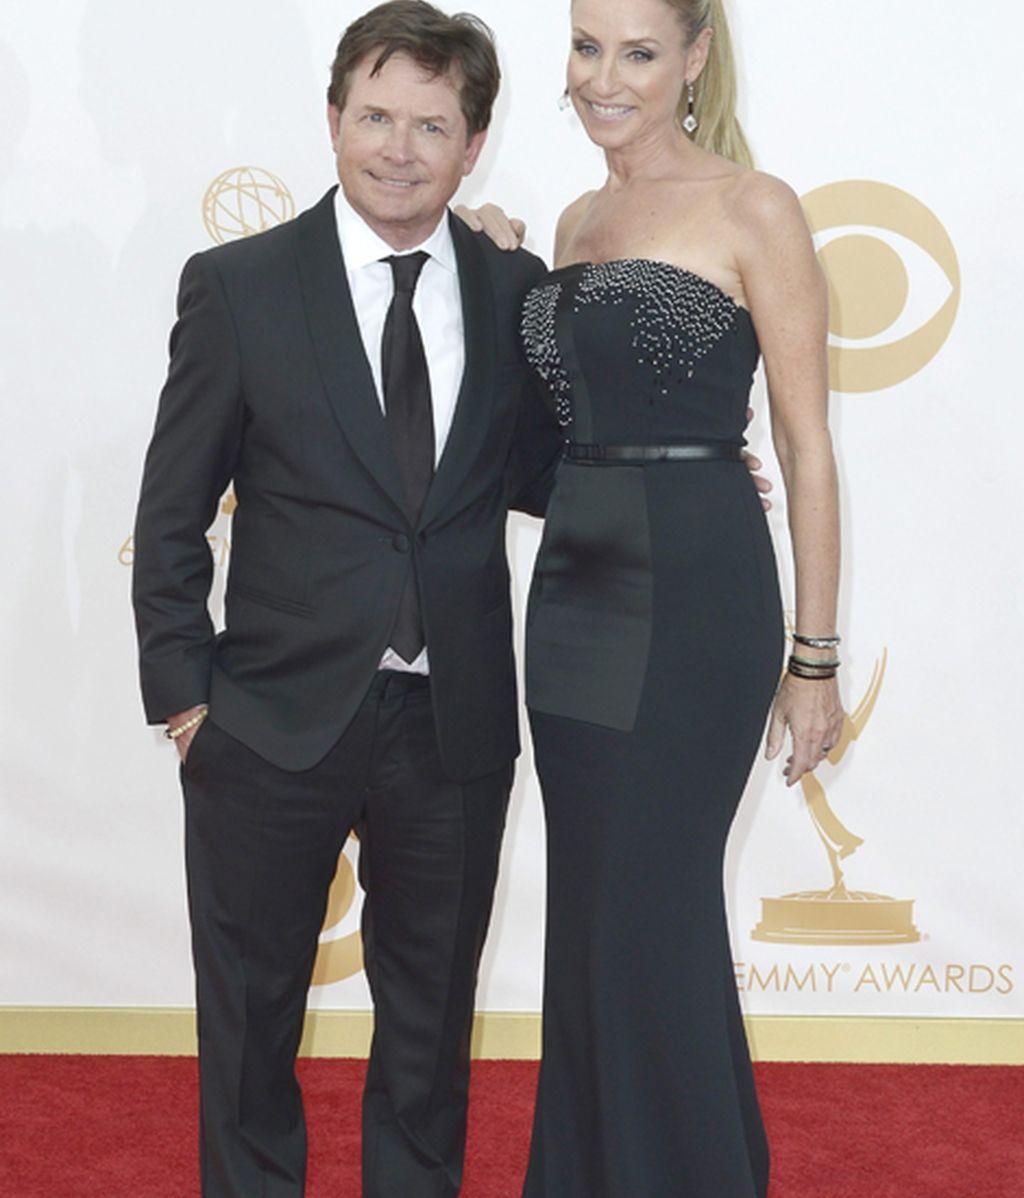 Michael J fox ('The good wife') y su esposa Tracy Pollan